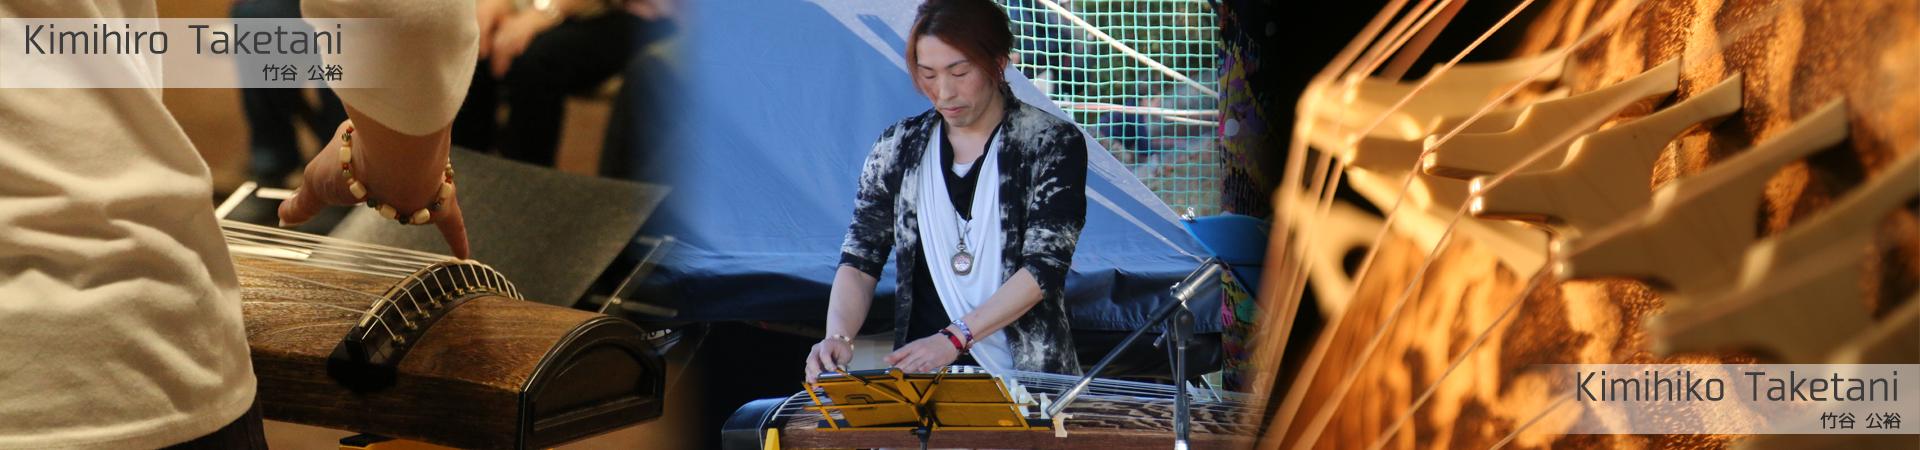 kimihiro-taketani